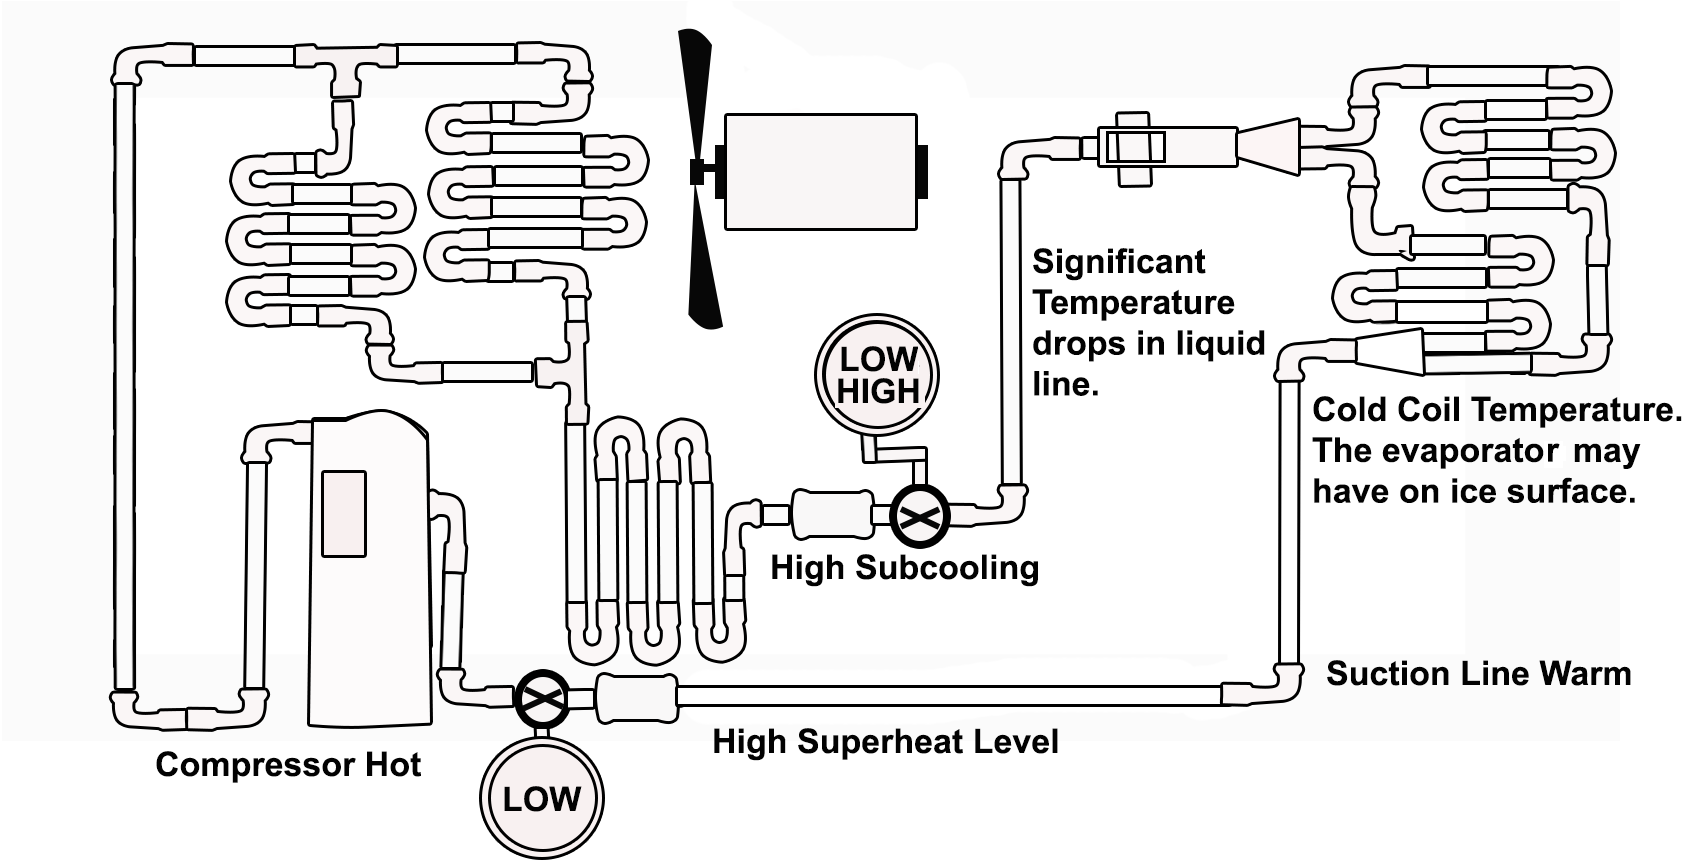 Restriction - Liquid Line